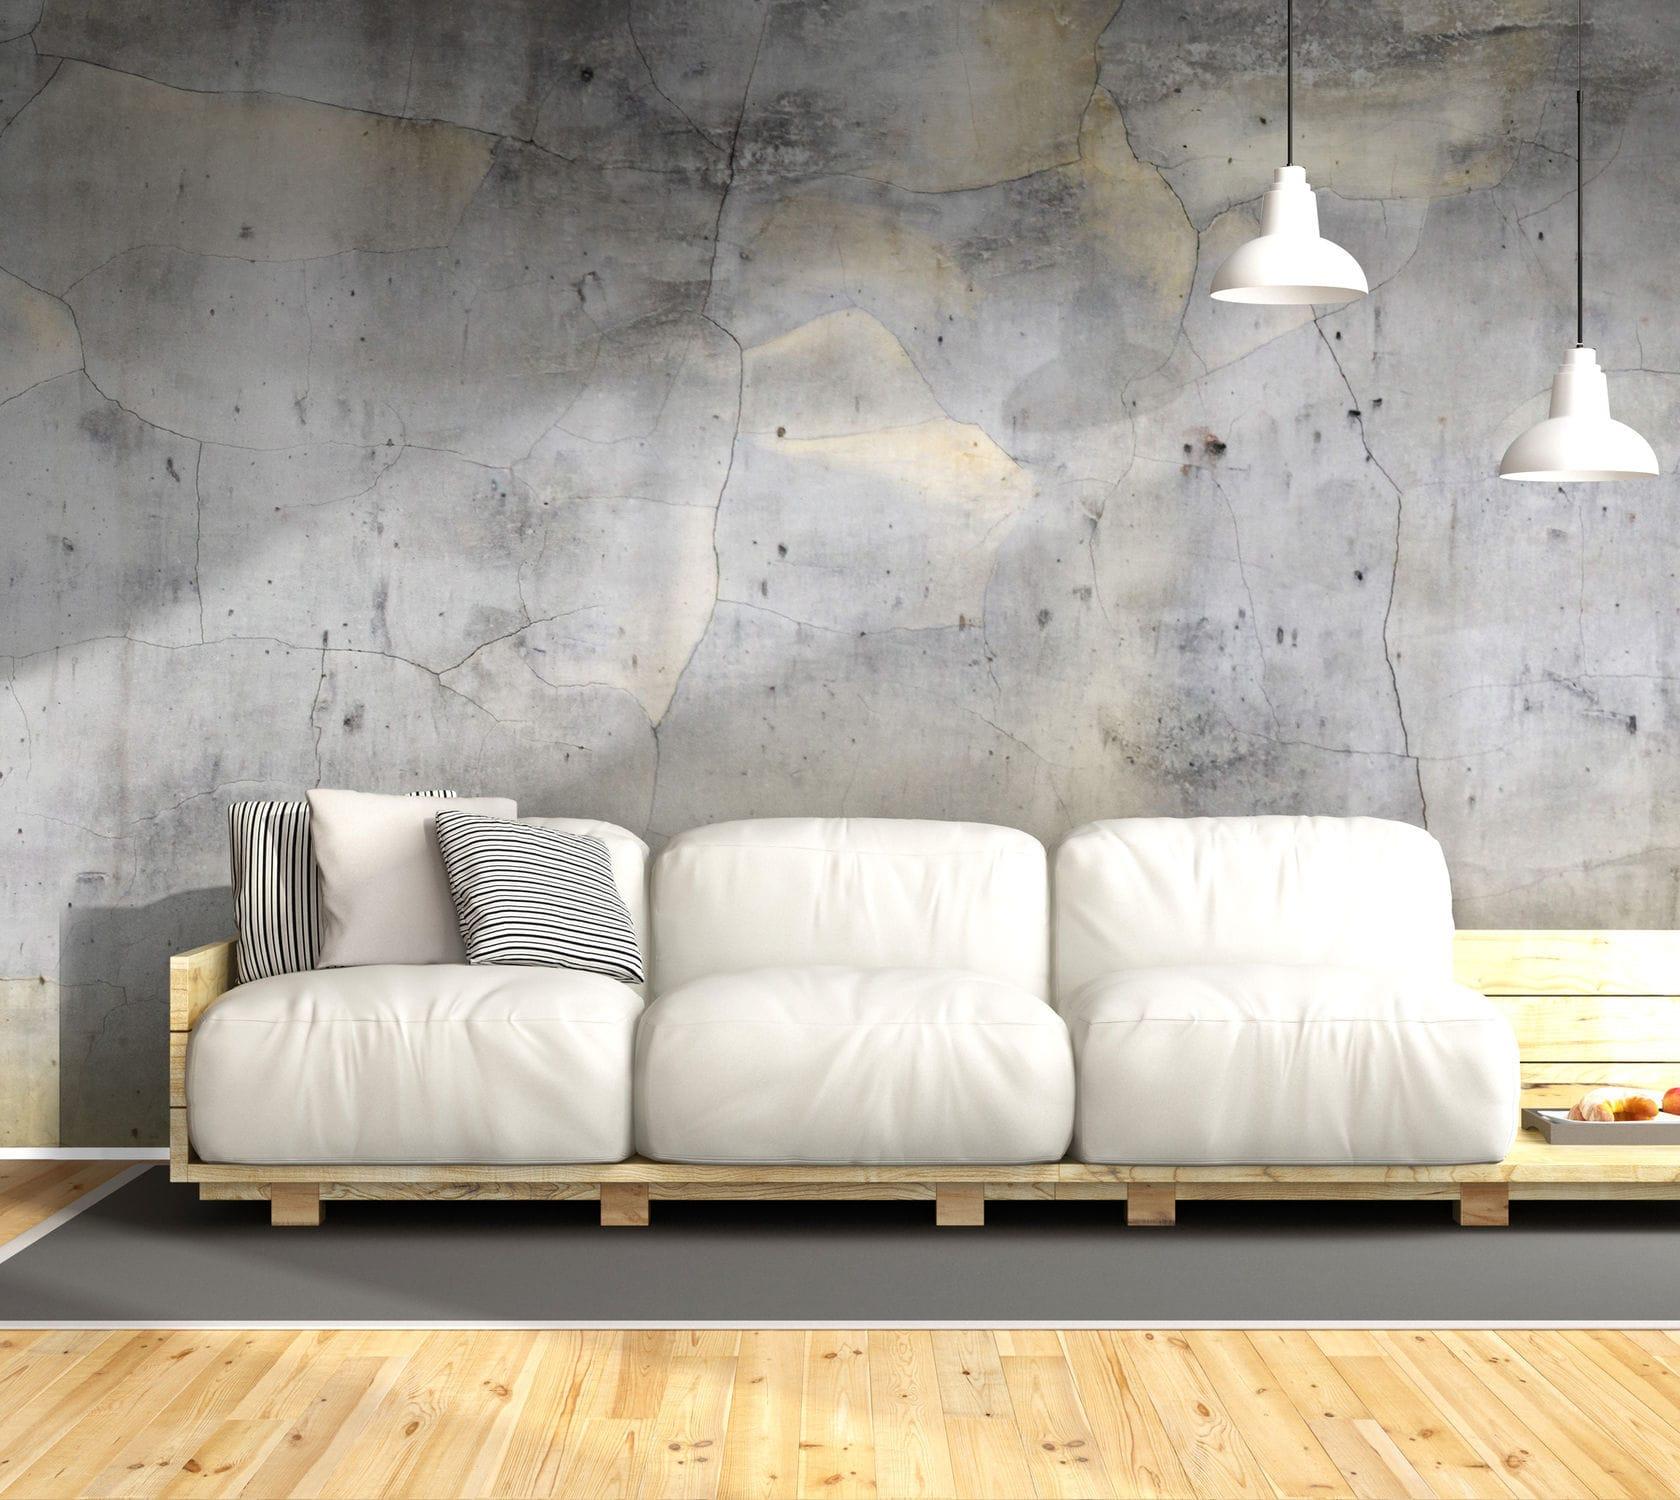 contemporary wallpaper / urban motif / concrete look - BM180 GOLD 1 & Contemporary wallpaper / urban motif / concrete look - BM180 GOLD 1 ...